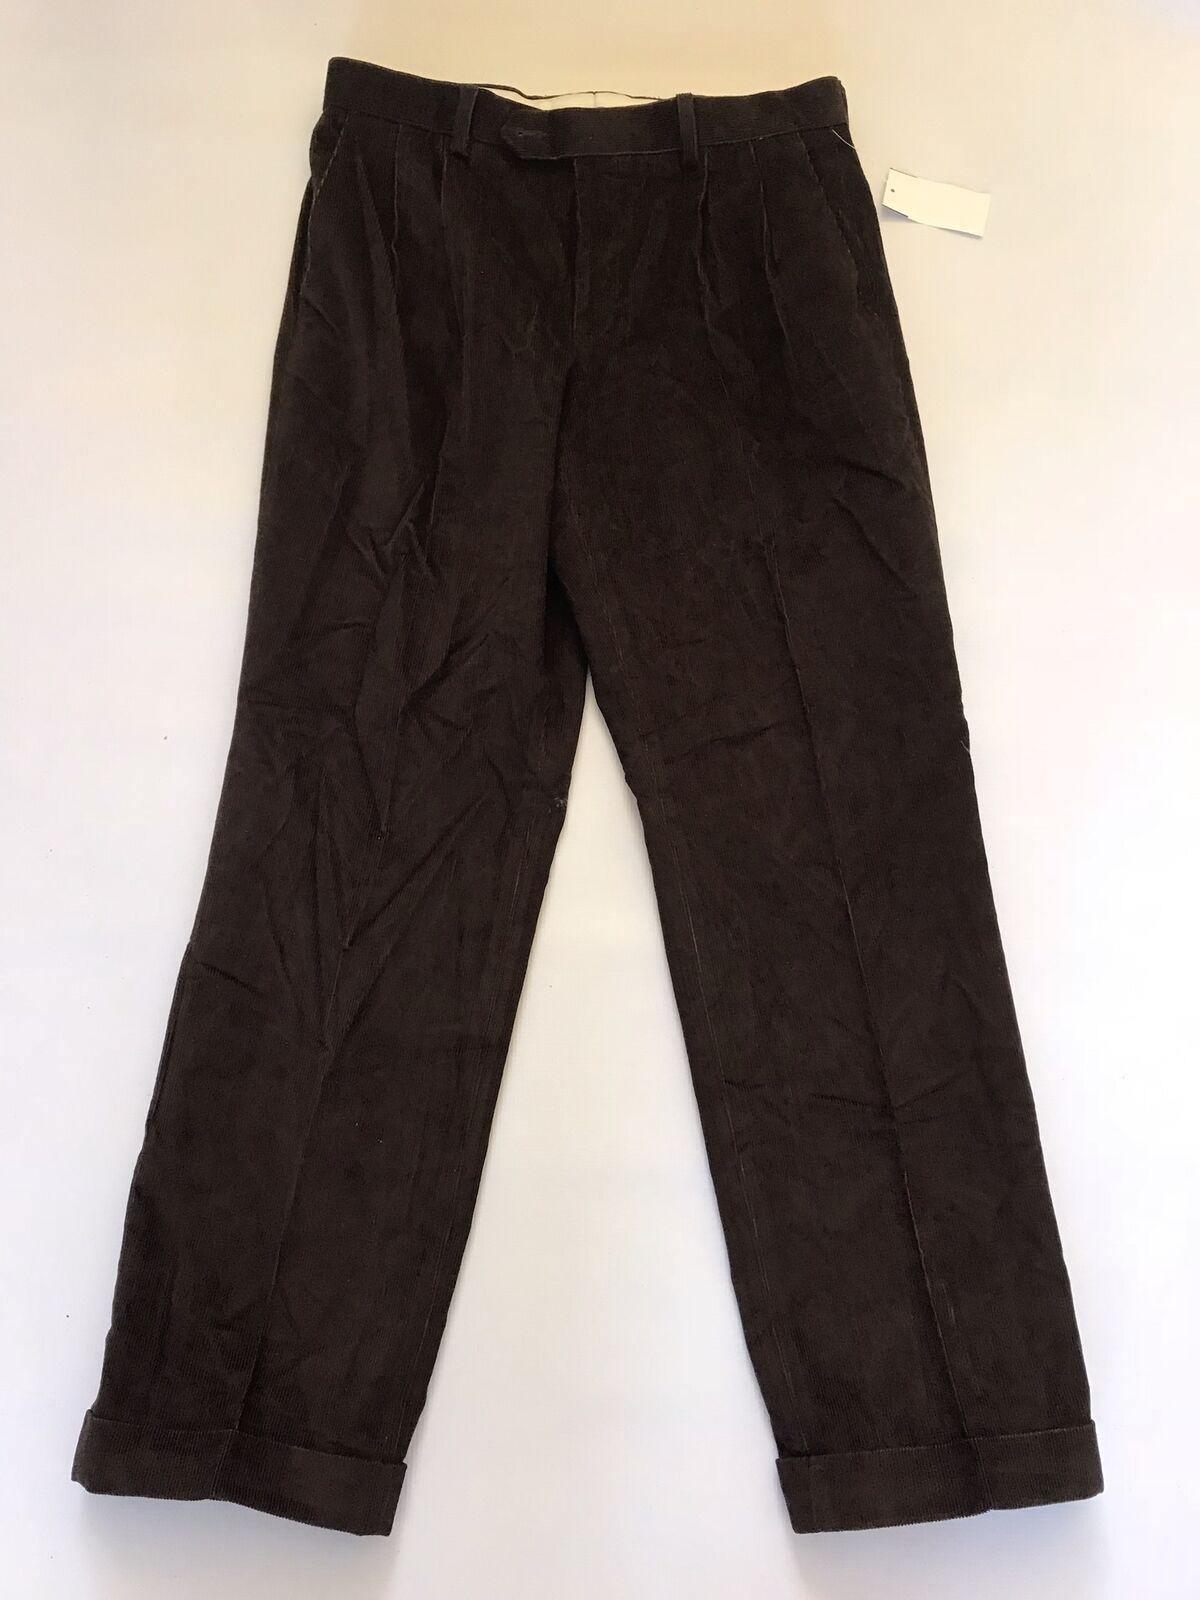 Lauren Ralph Lauren Pleated Corduroy Cuffed Dress Pants Brown Mens 32x30 New